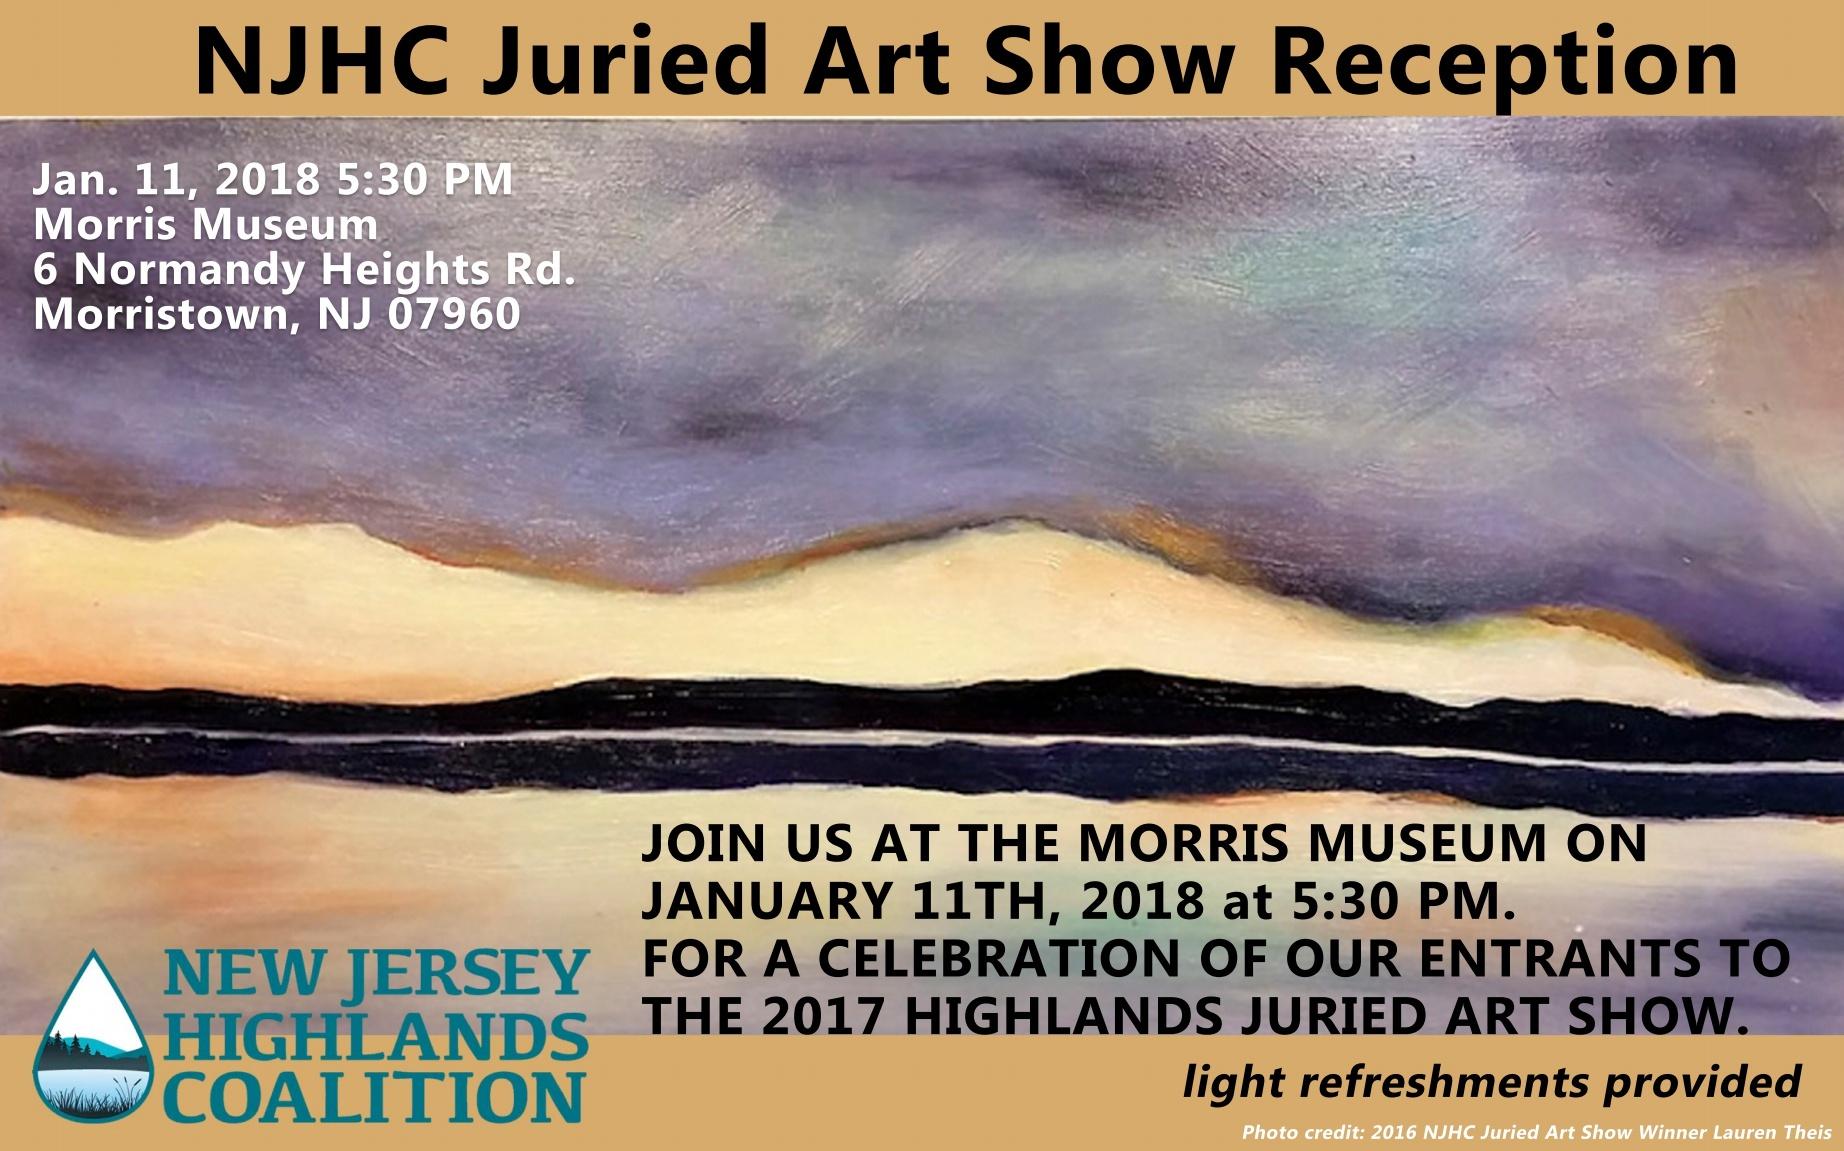 NJ Highlands Coalition Reception Notice